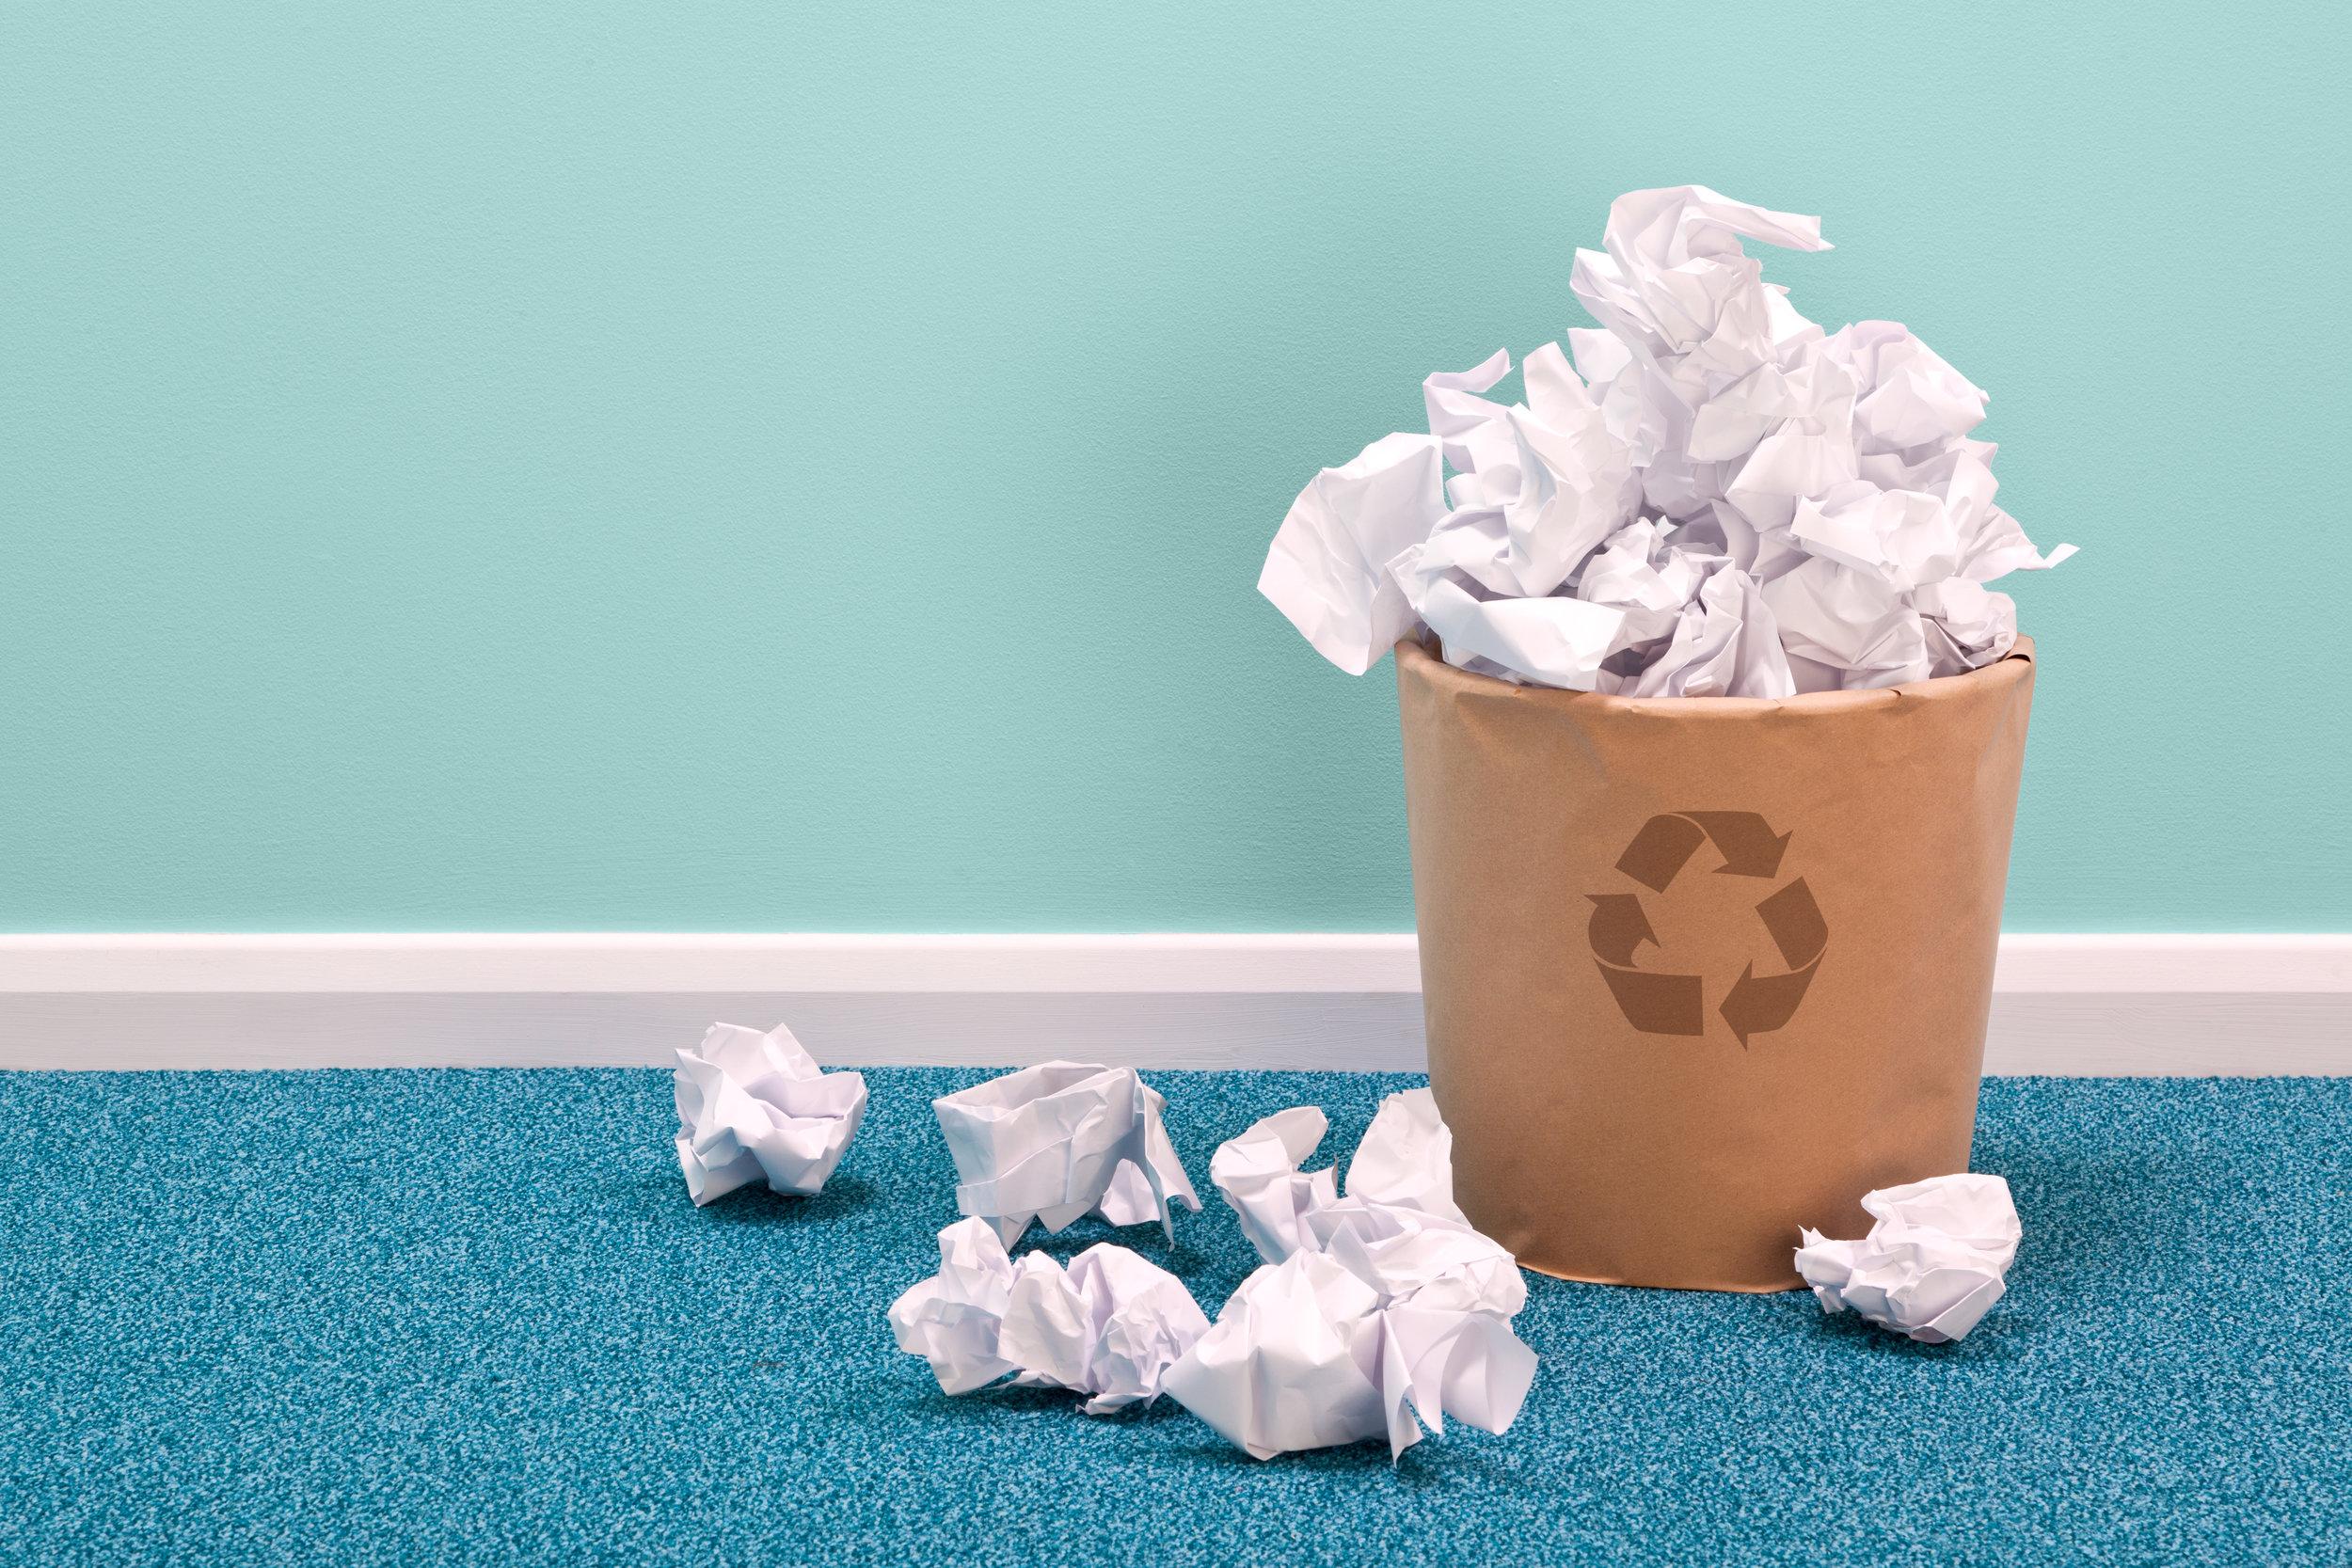 paper recycling bin on blue carpet